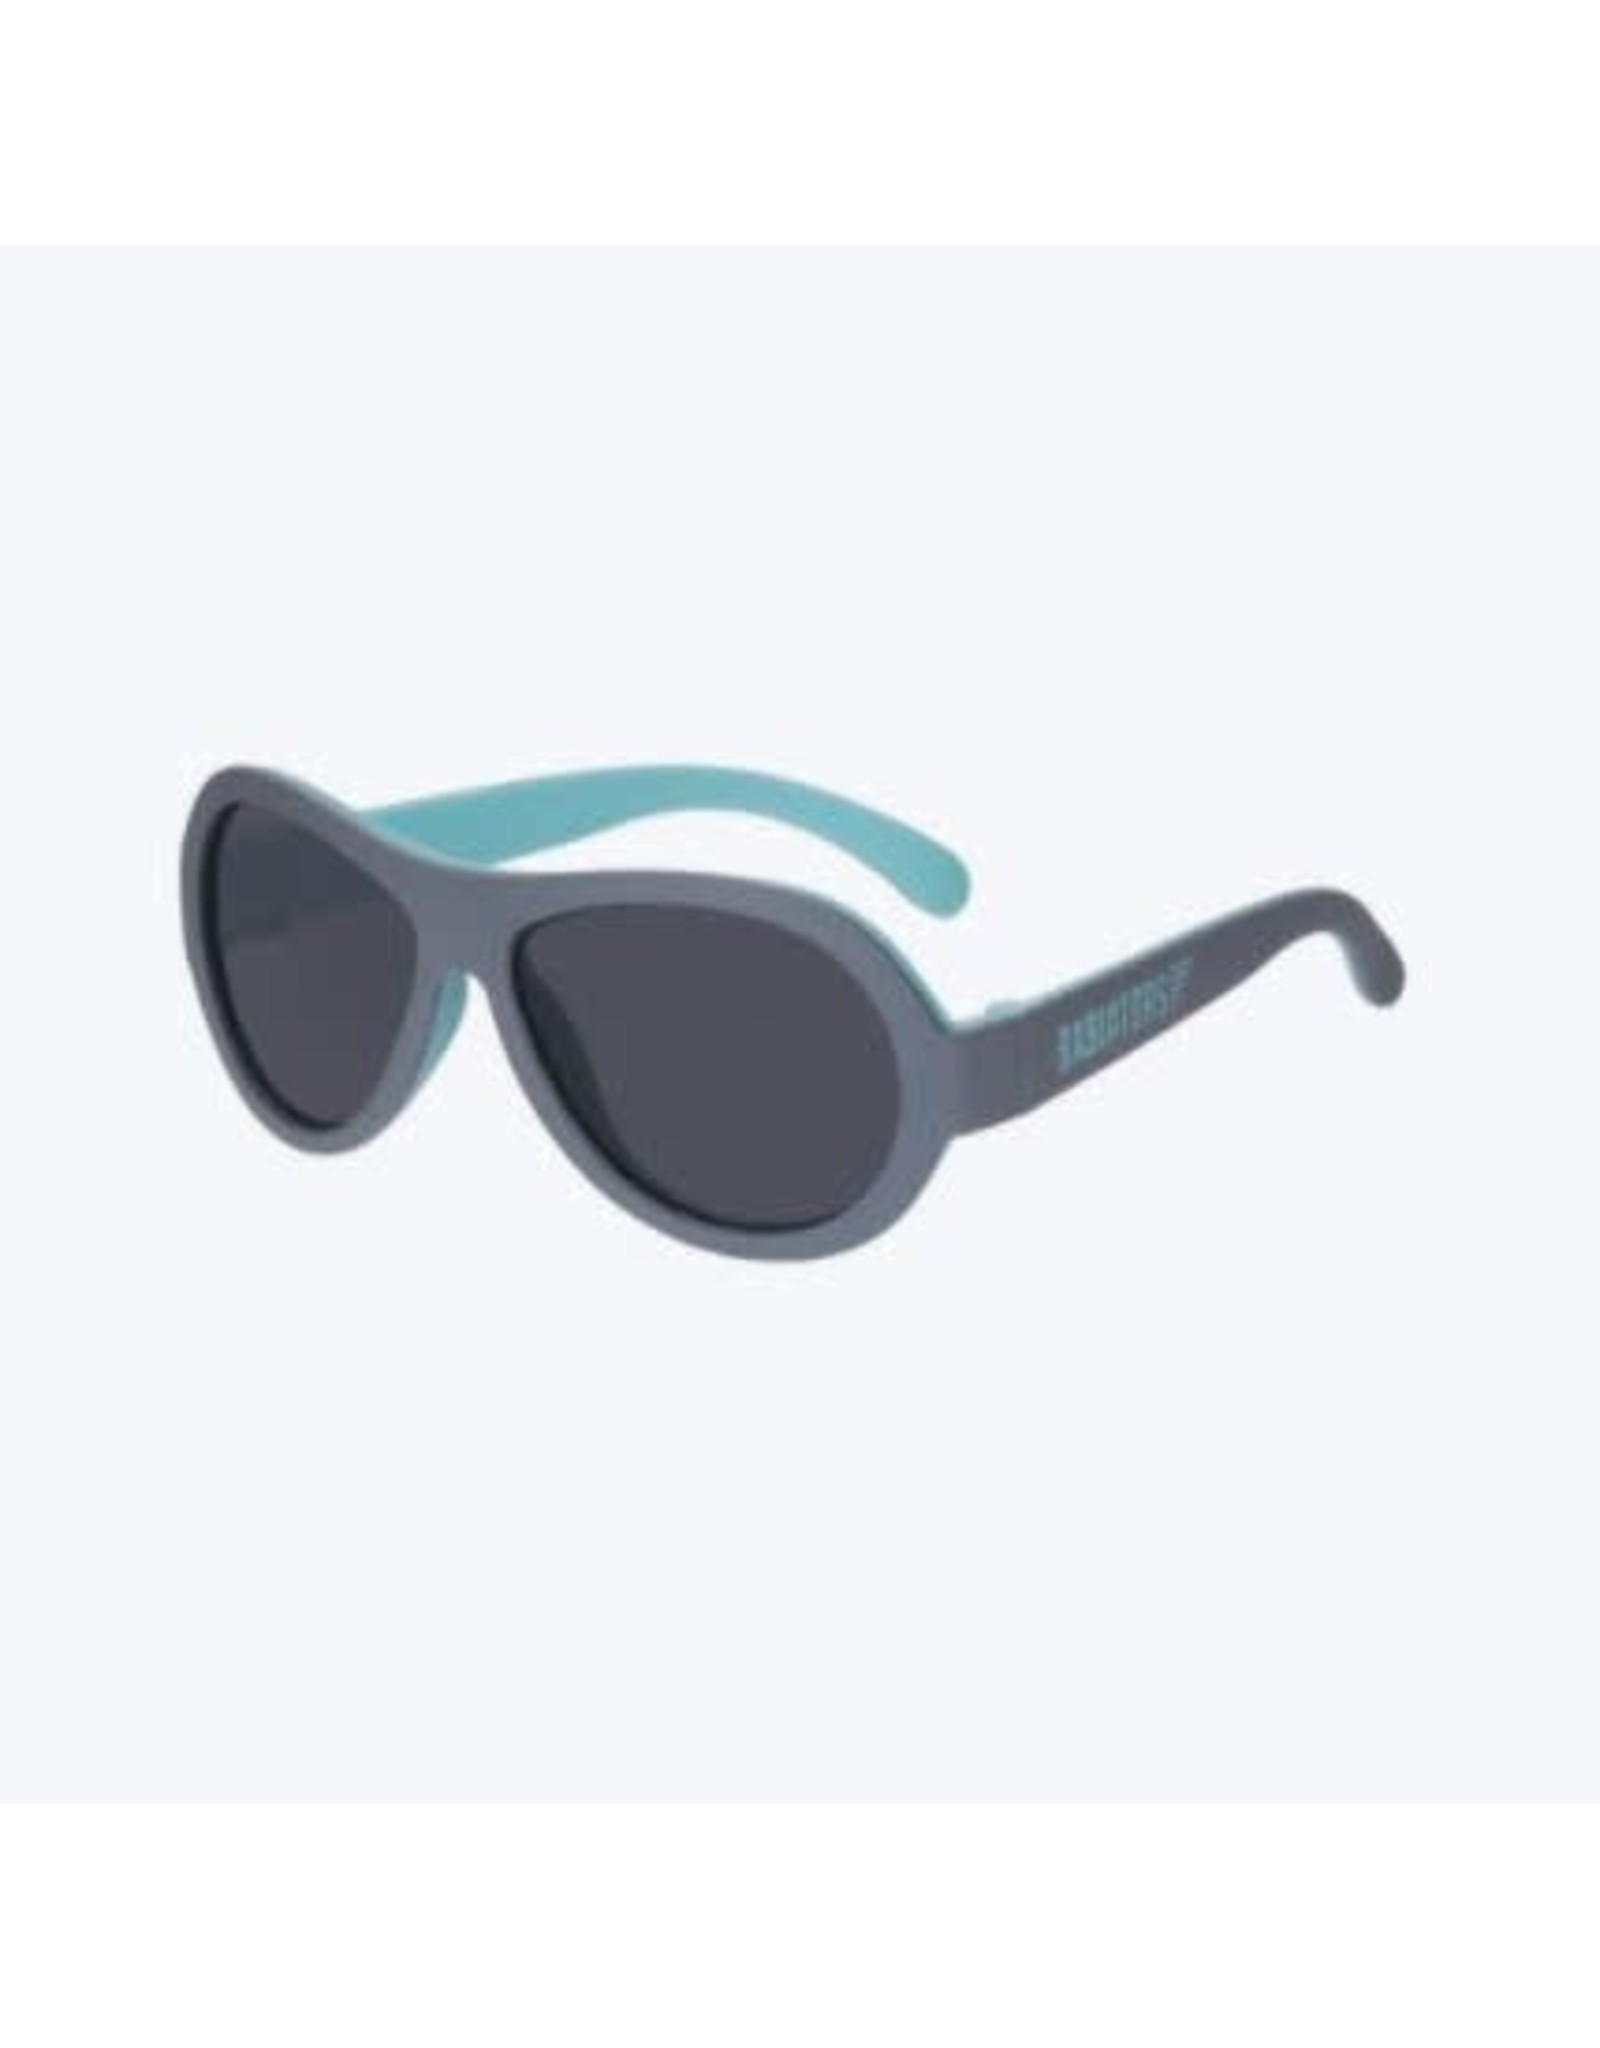 "Babiators ""Sea Spray Two-Tone Aviators"" Sunglasses"